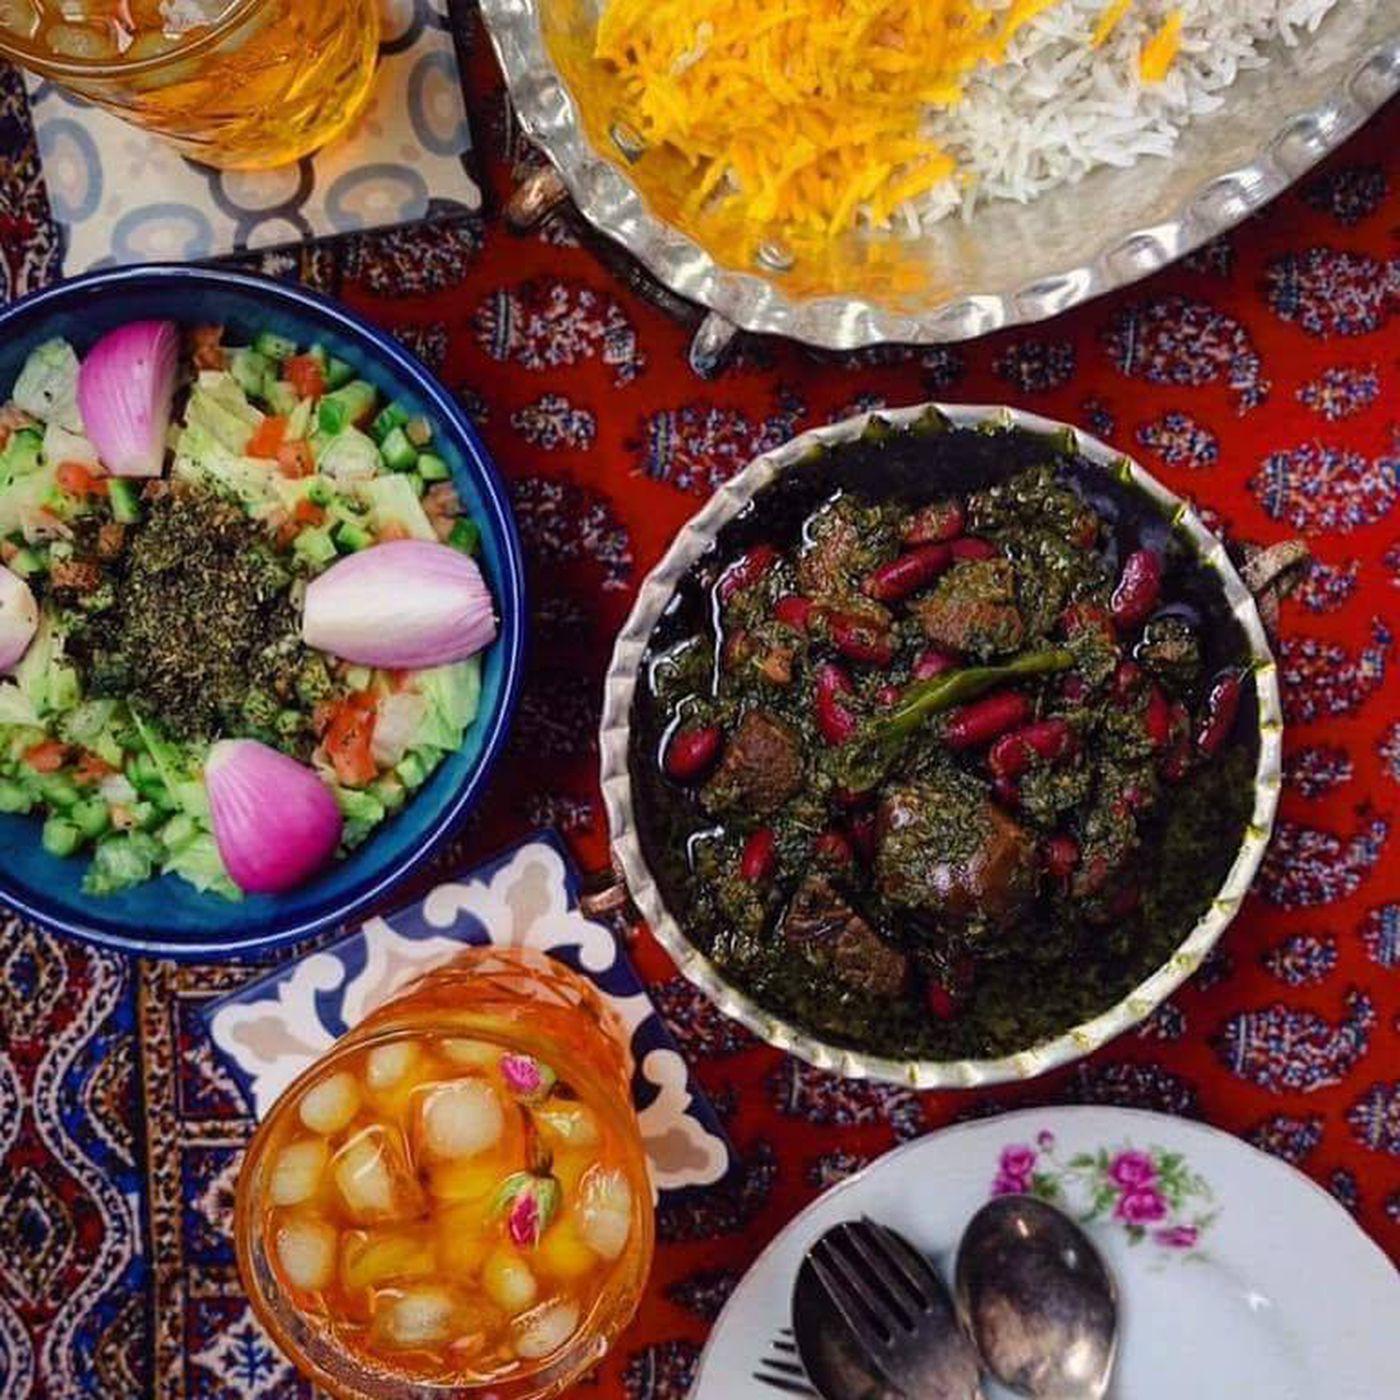 Online Grocery Persian Basket In Marietta Sells Prepared